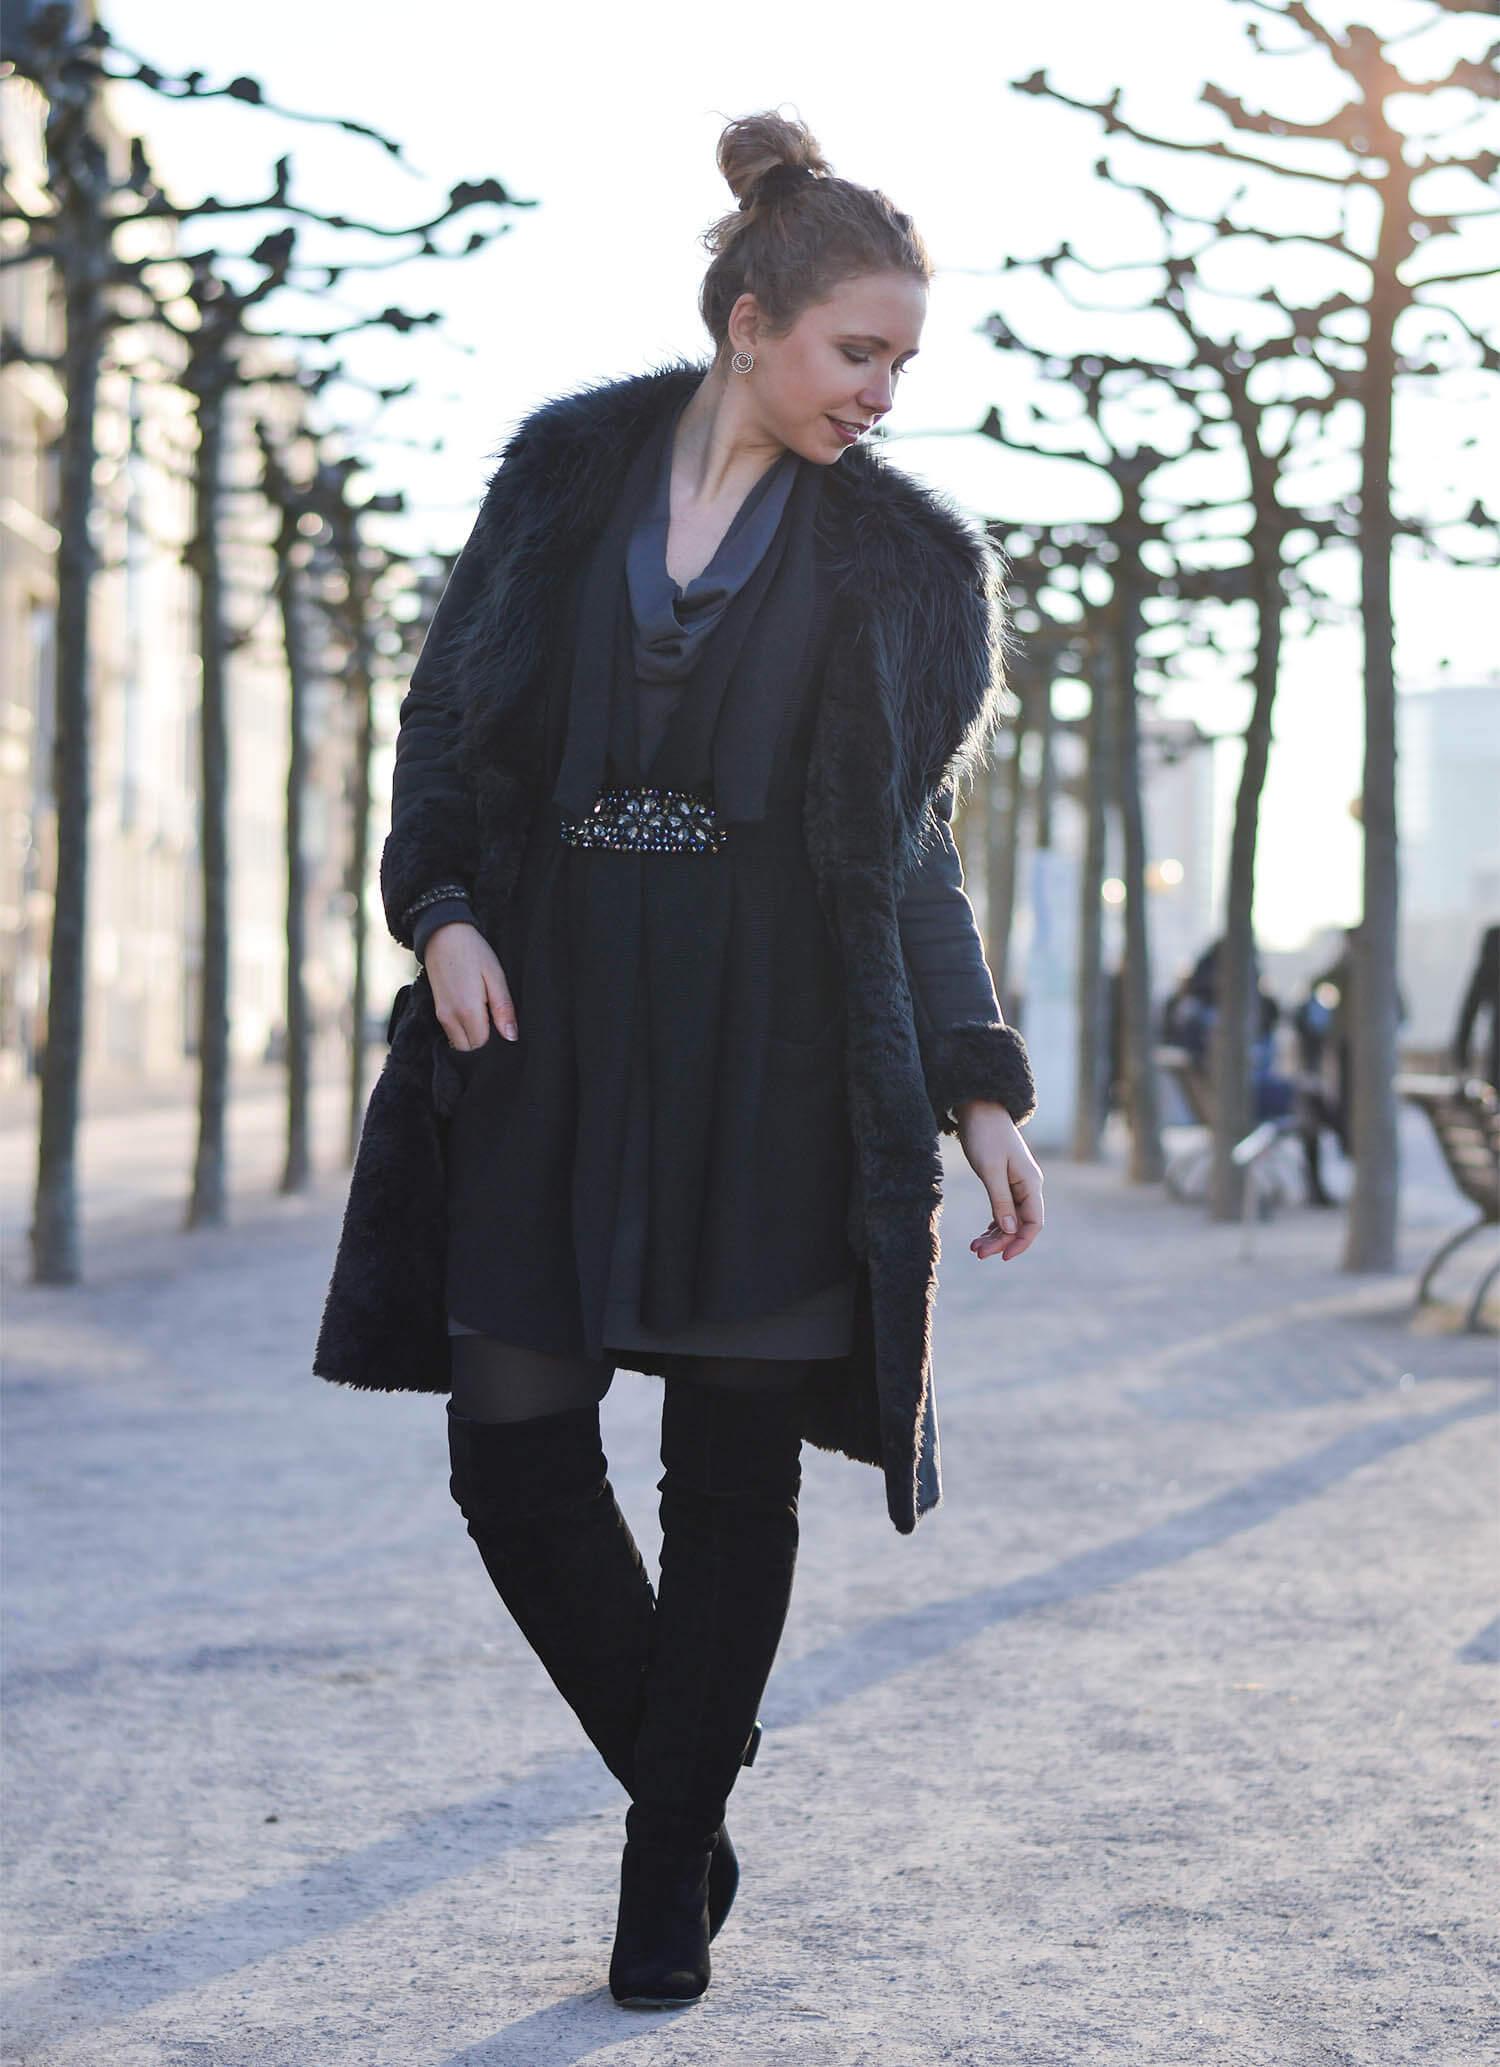 Kationette-fashionblog-Outfit-Shadesofgrey-Shearling-Knit-Overknees-Dusseldorf-curls-bun